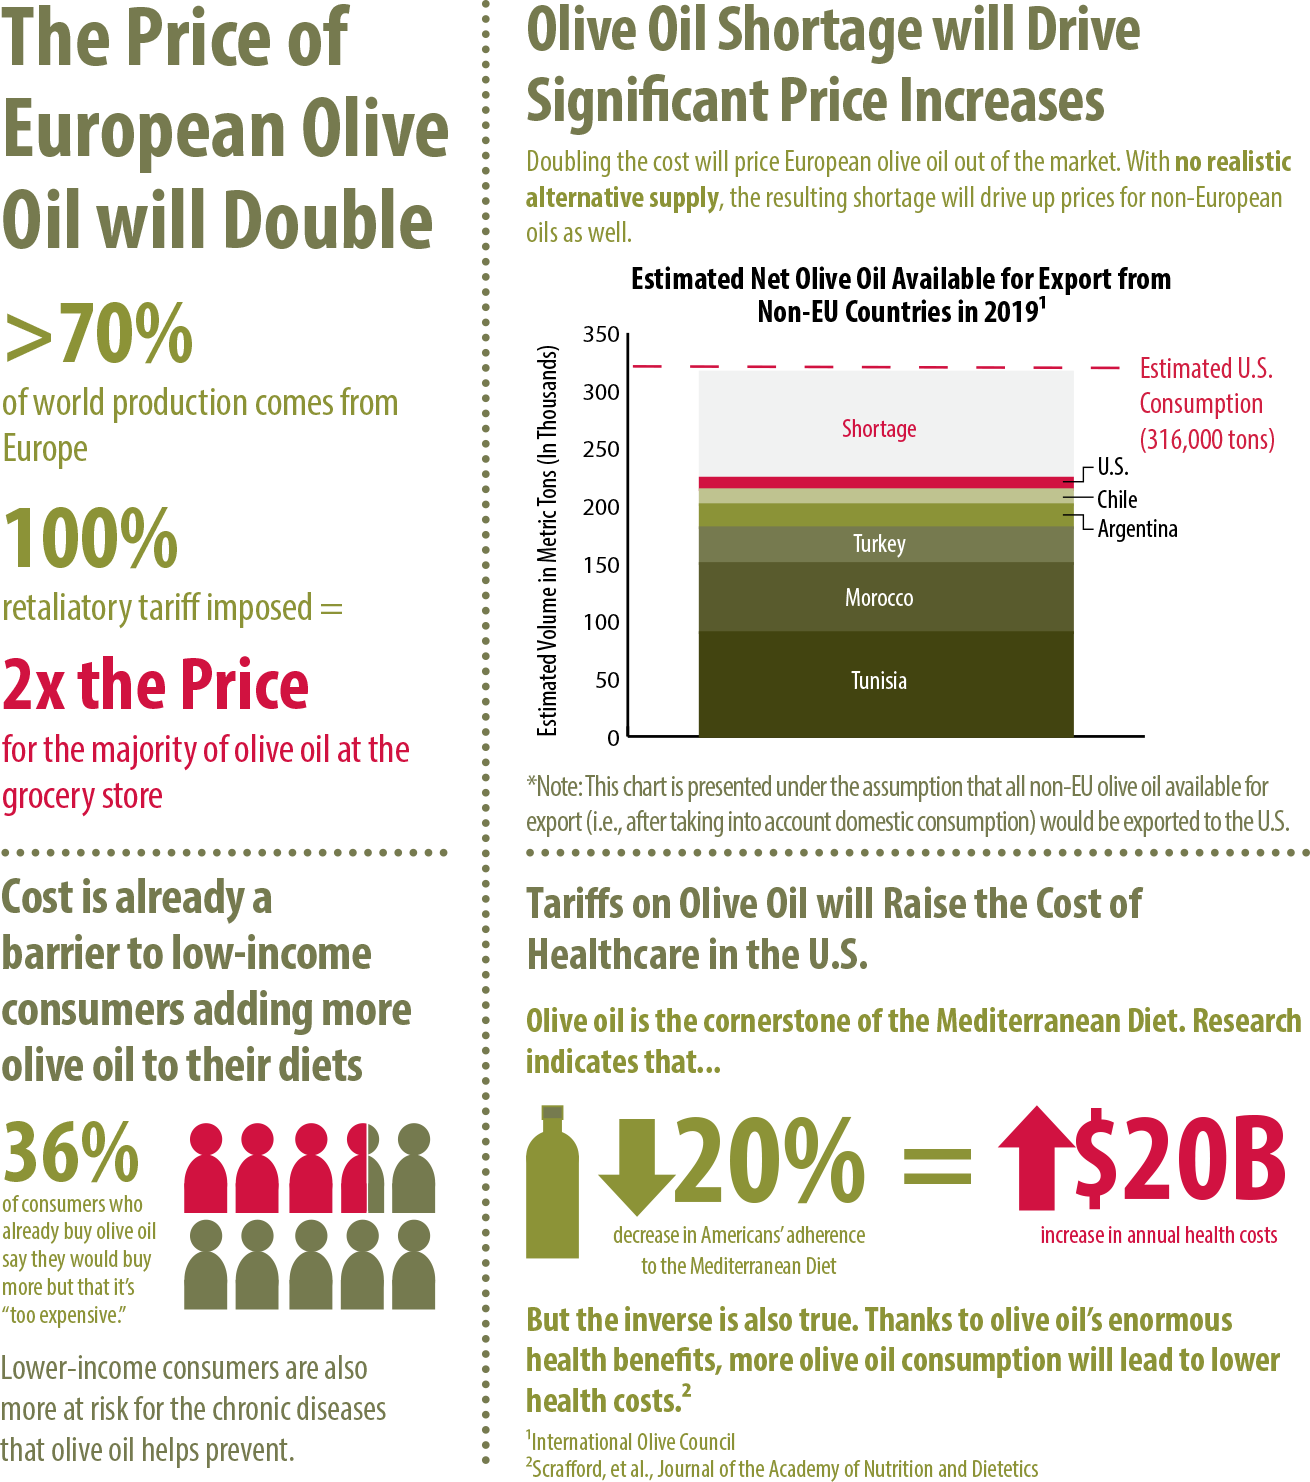 Tariff Price Infographic_v2_7.16.19